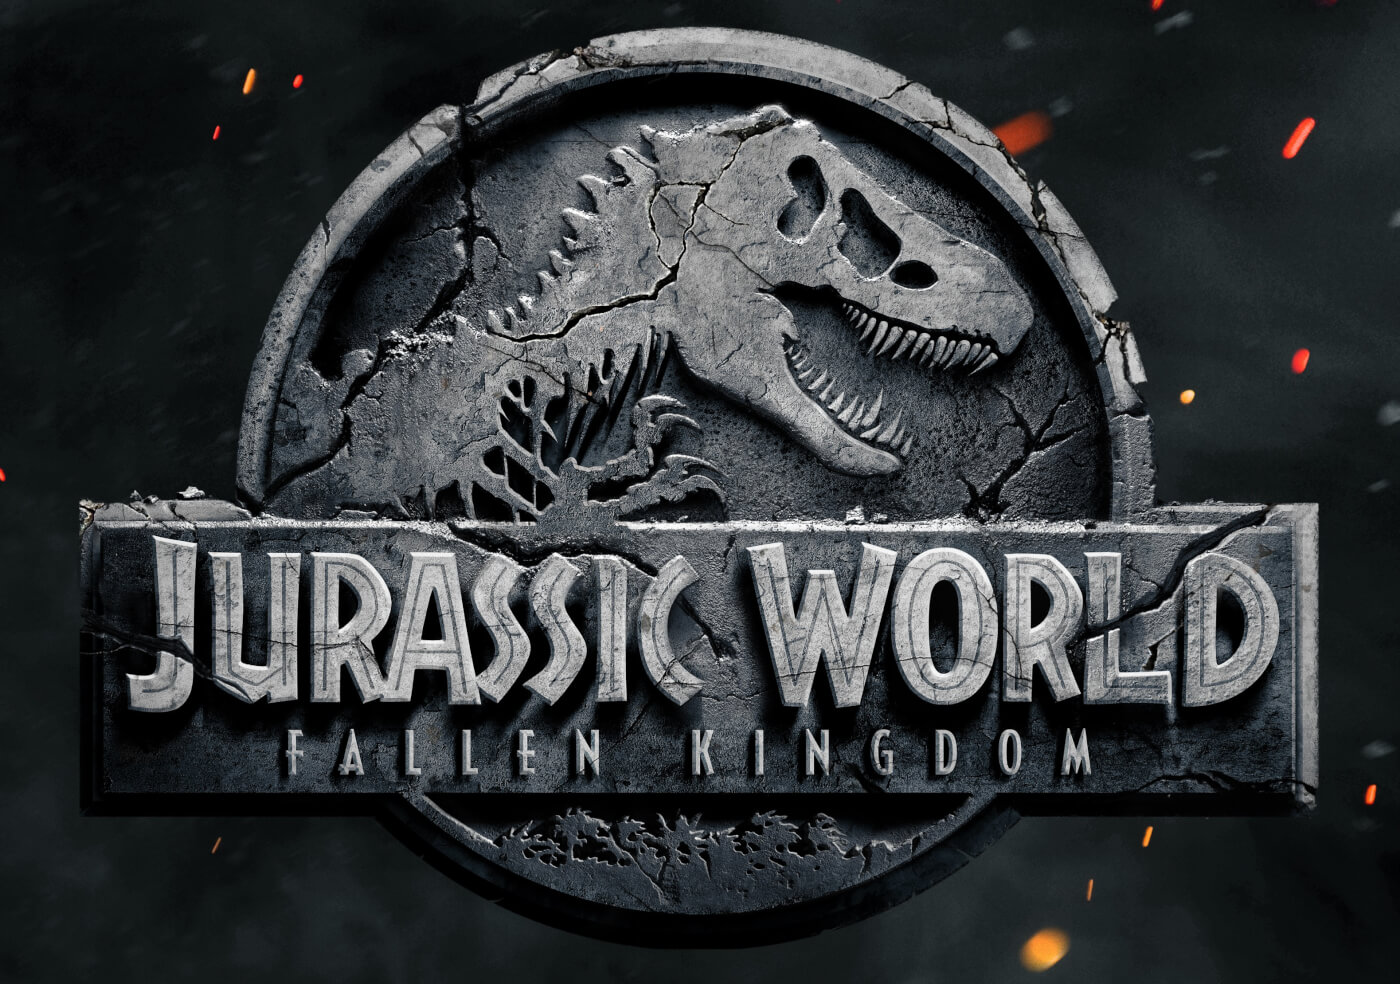 Jurassic World 2 is Officially Titled: FALLEN KINGDOM